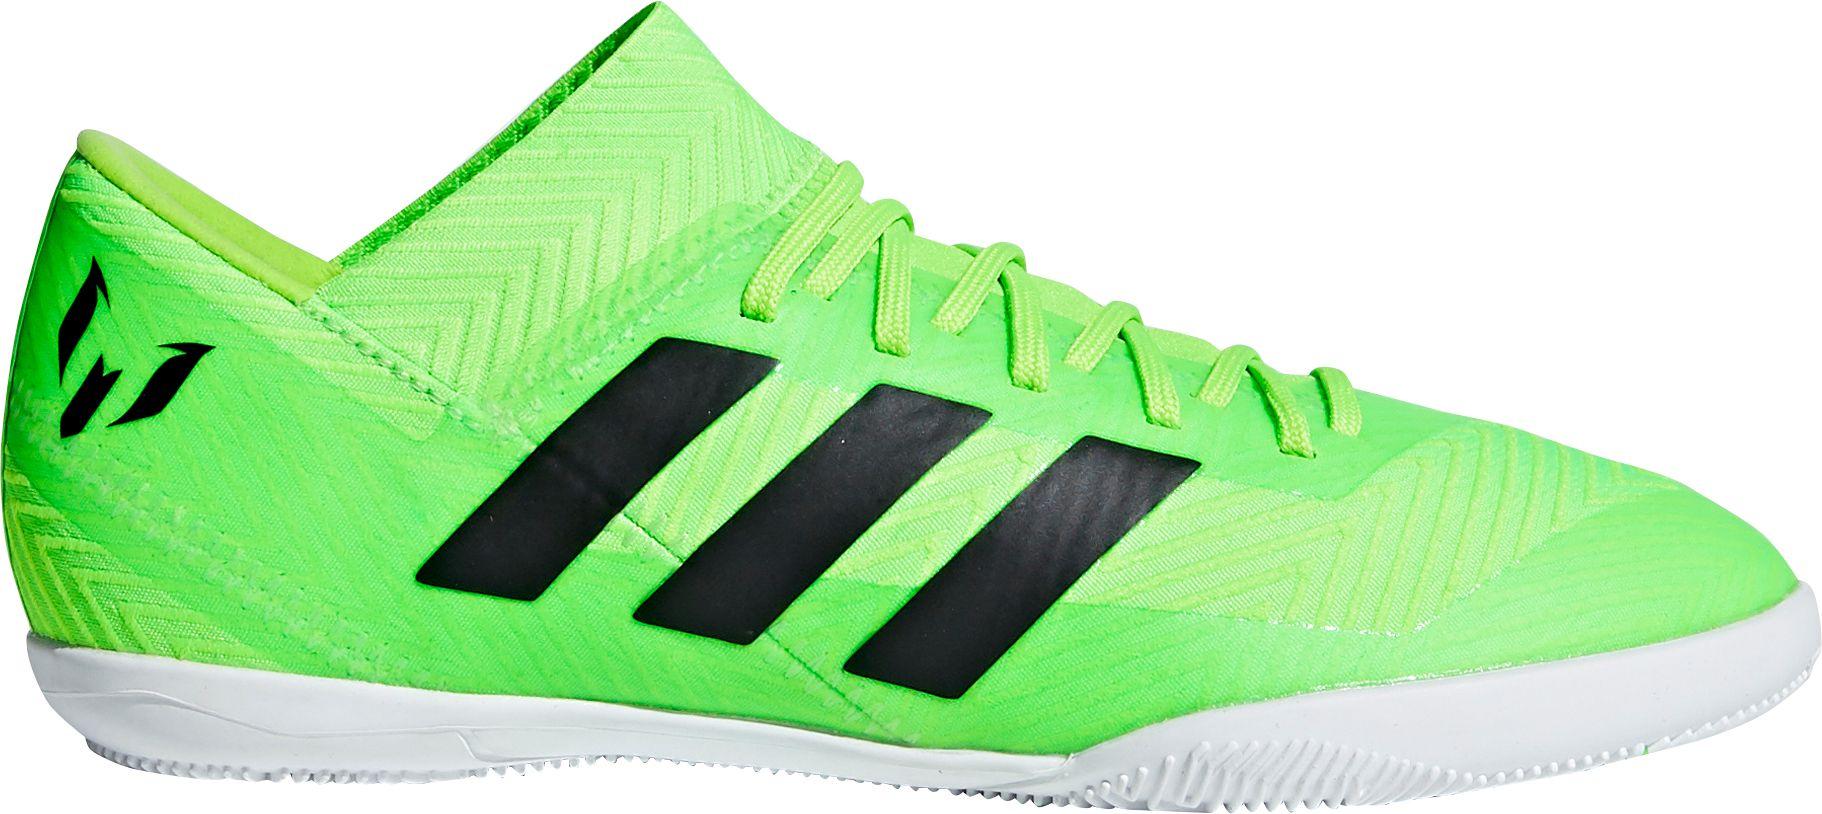 93a45867aeb26 adidas Kids' Nemeziz Messi Tango 18.3 Indoor Soccer Shoes, Green ...